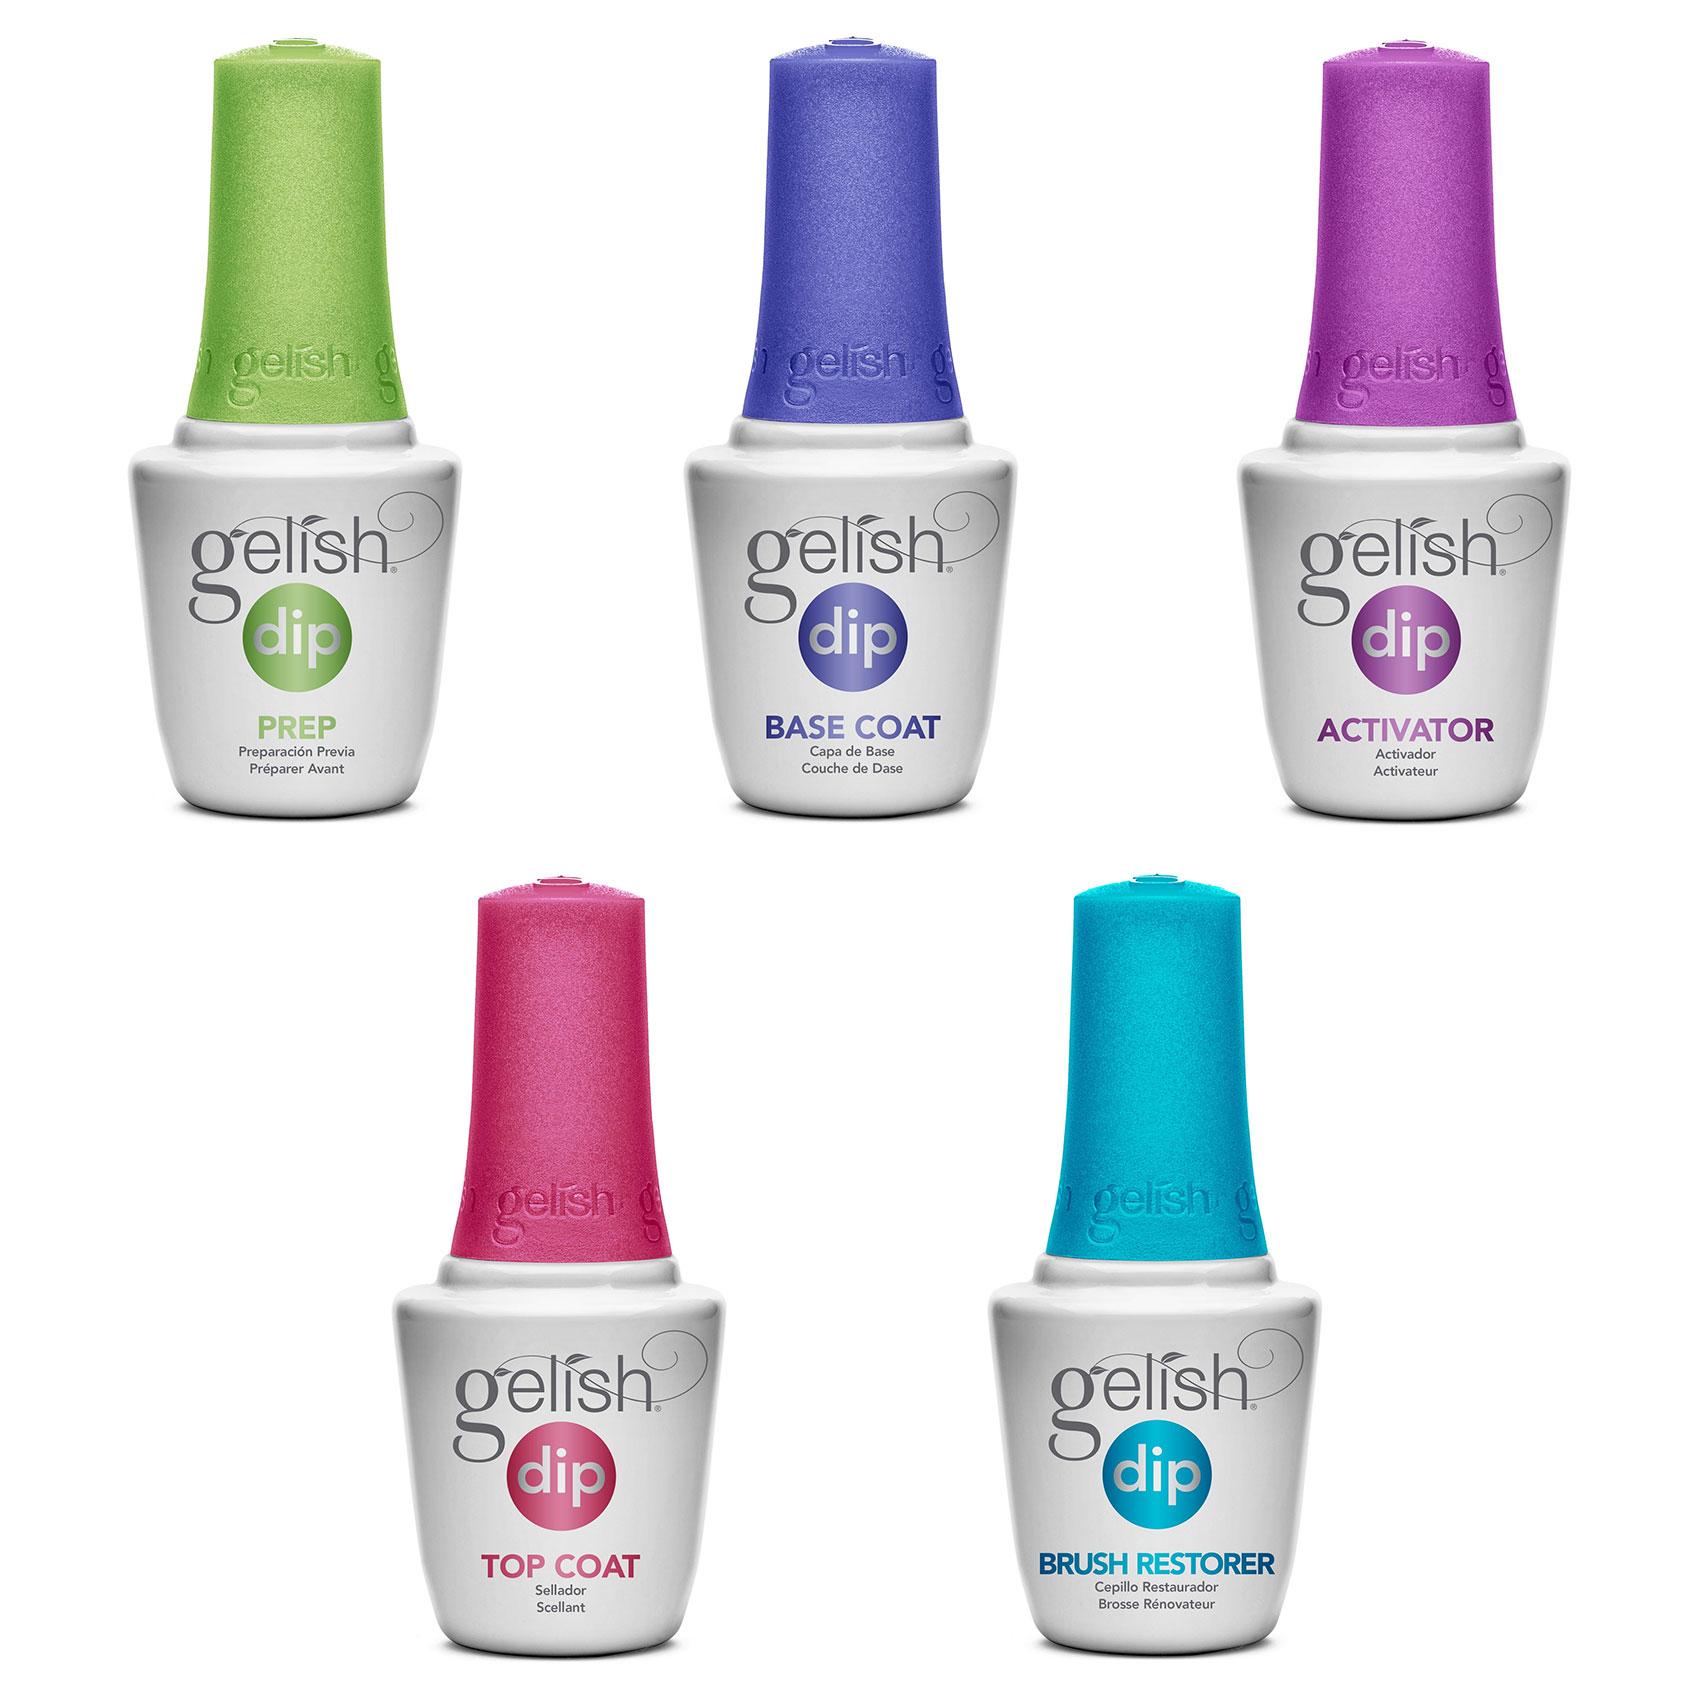 Gelish Soak Off French Tip Acrylic Powder Nail Polish Dip